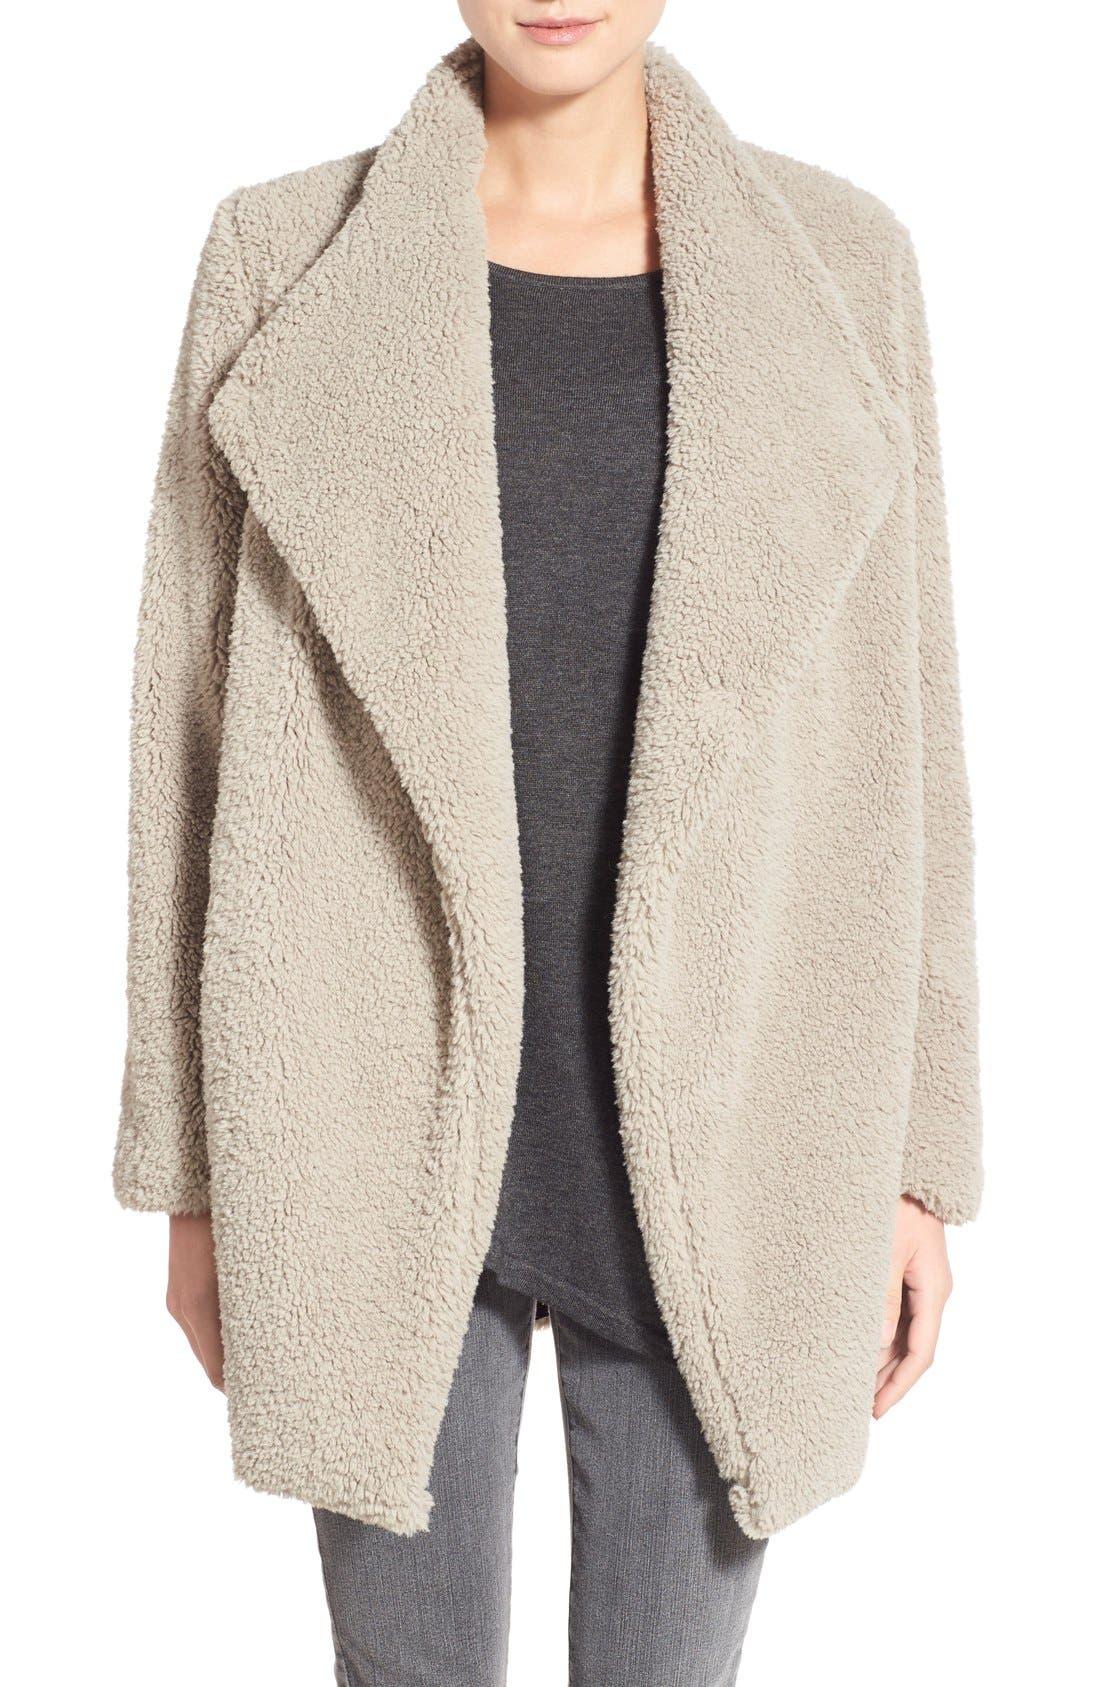 Alternate Image 1 Selected - BB Dakota 'Daylin' Faux Fur One Button Coat